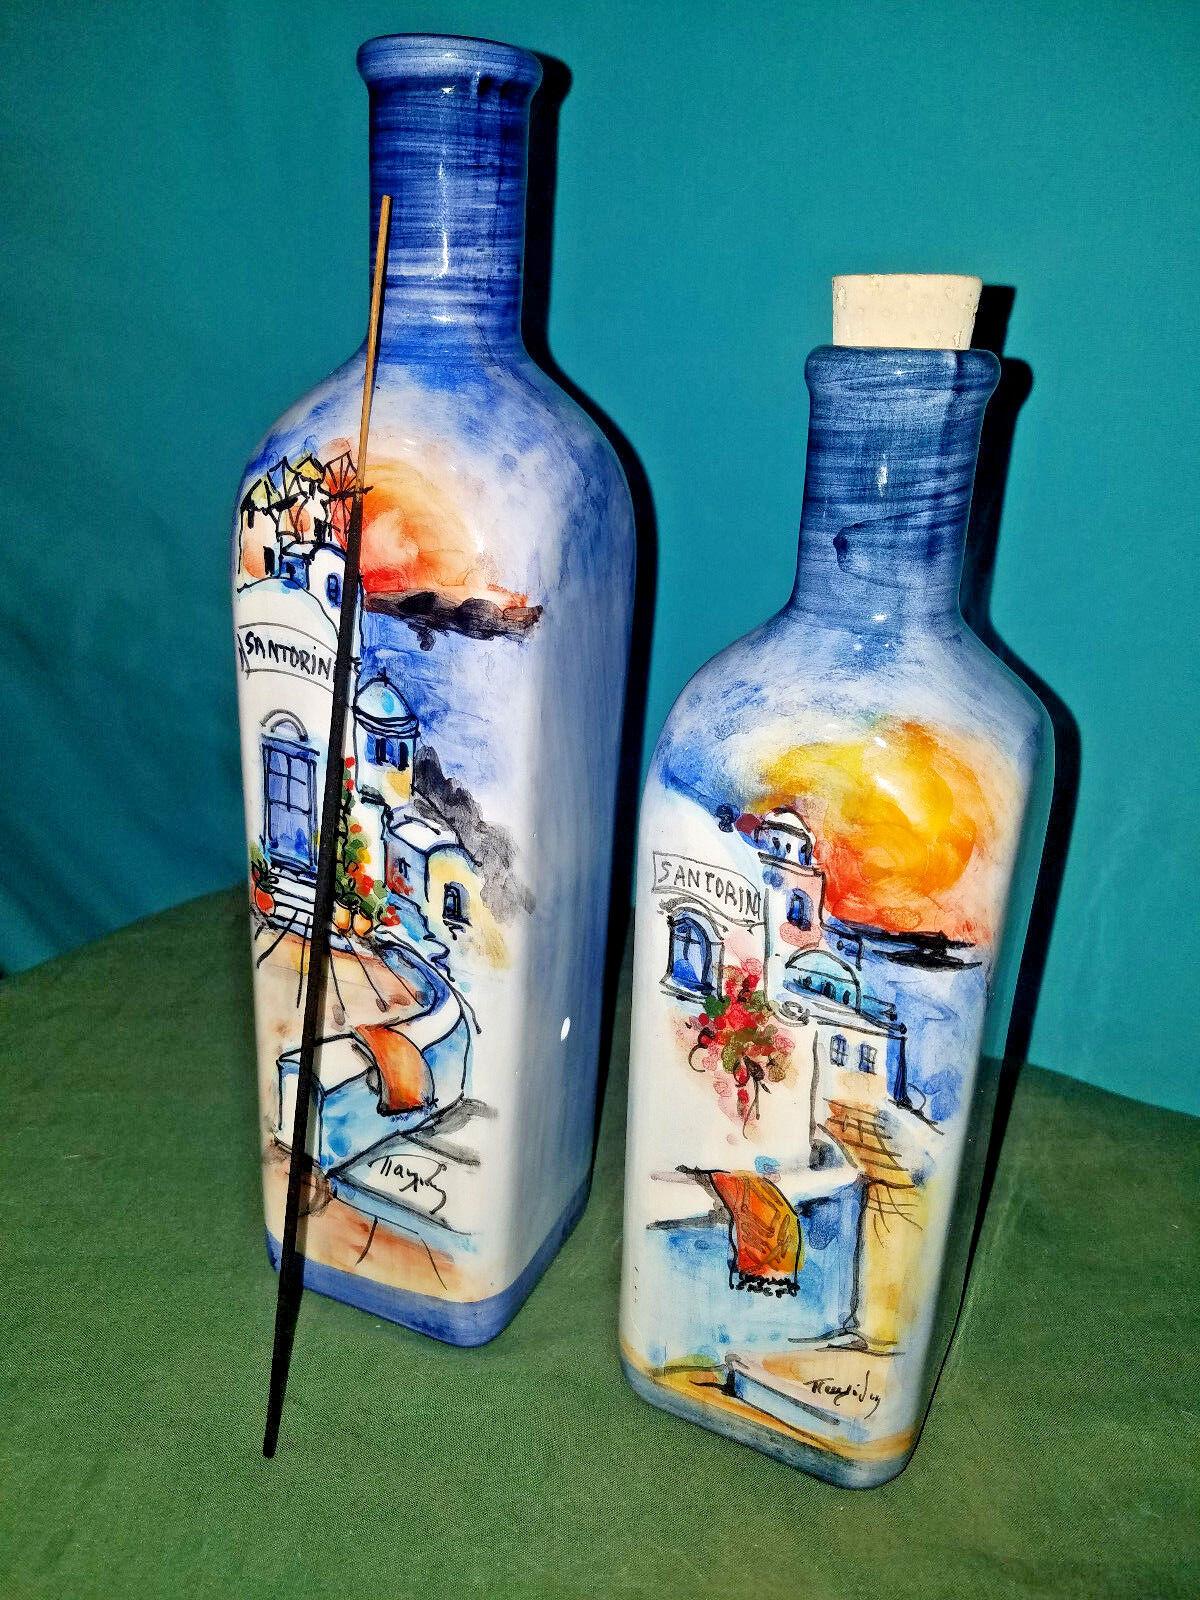 Handpainted in Greece Beautiful Art Santorini Incense Bottle Burner with Mate